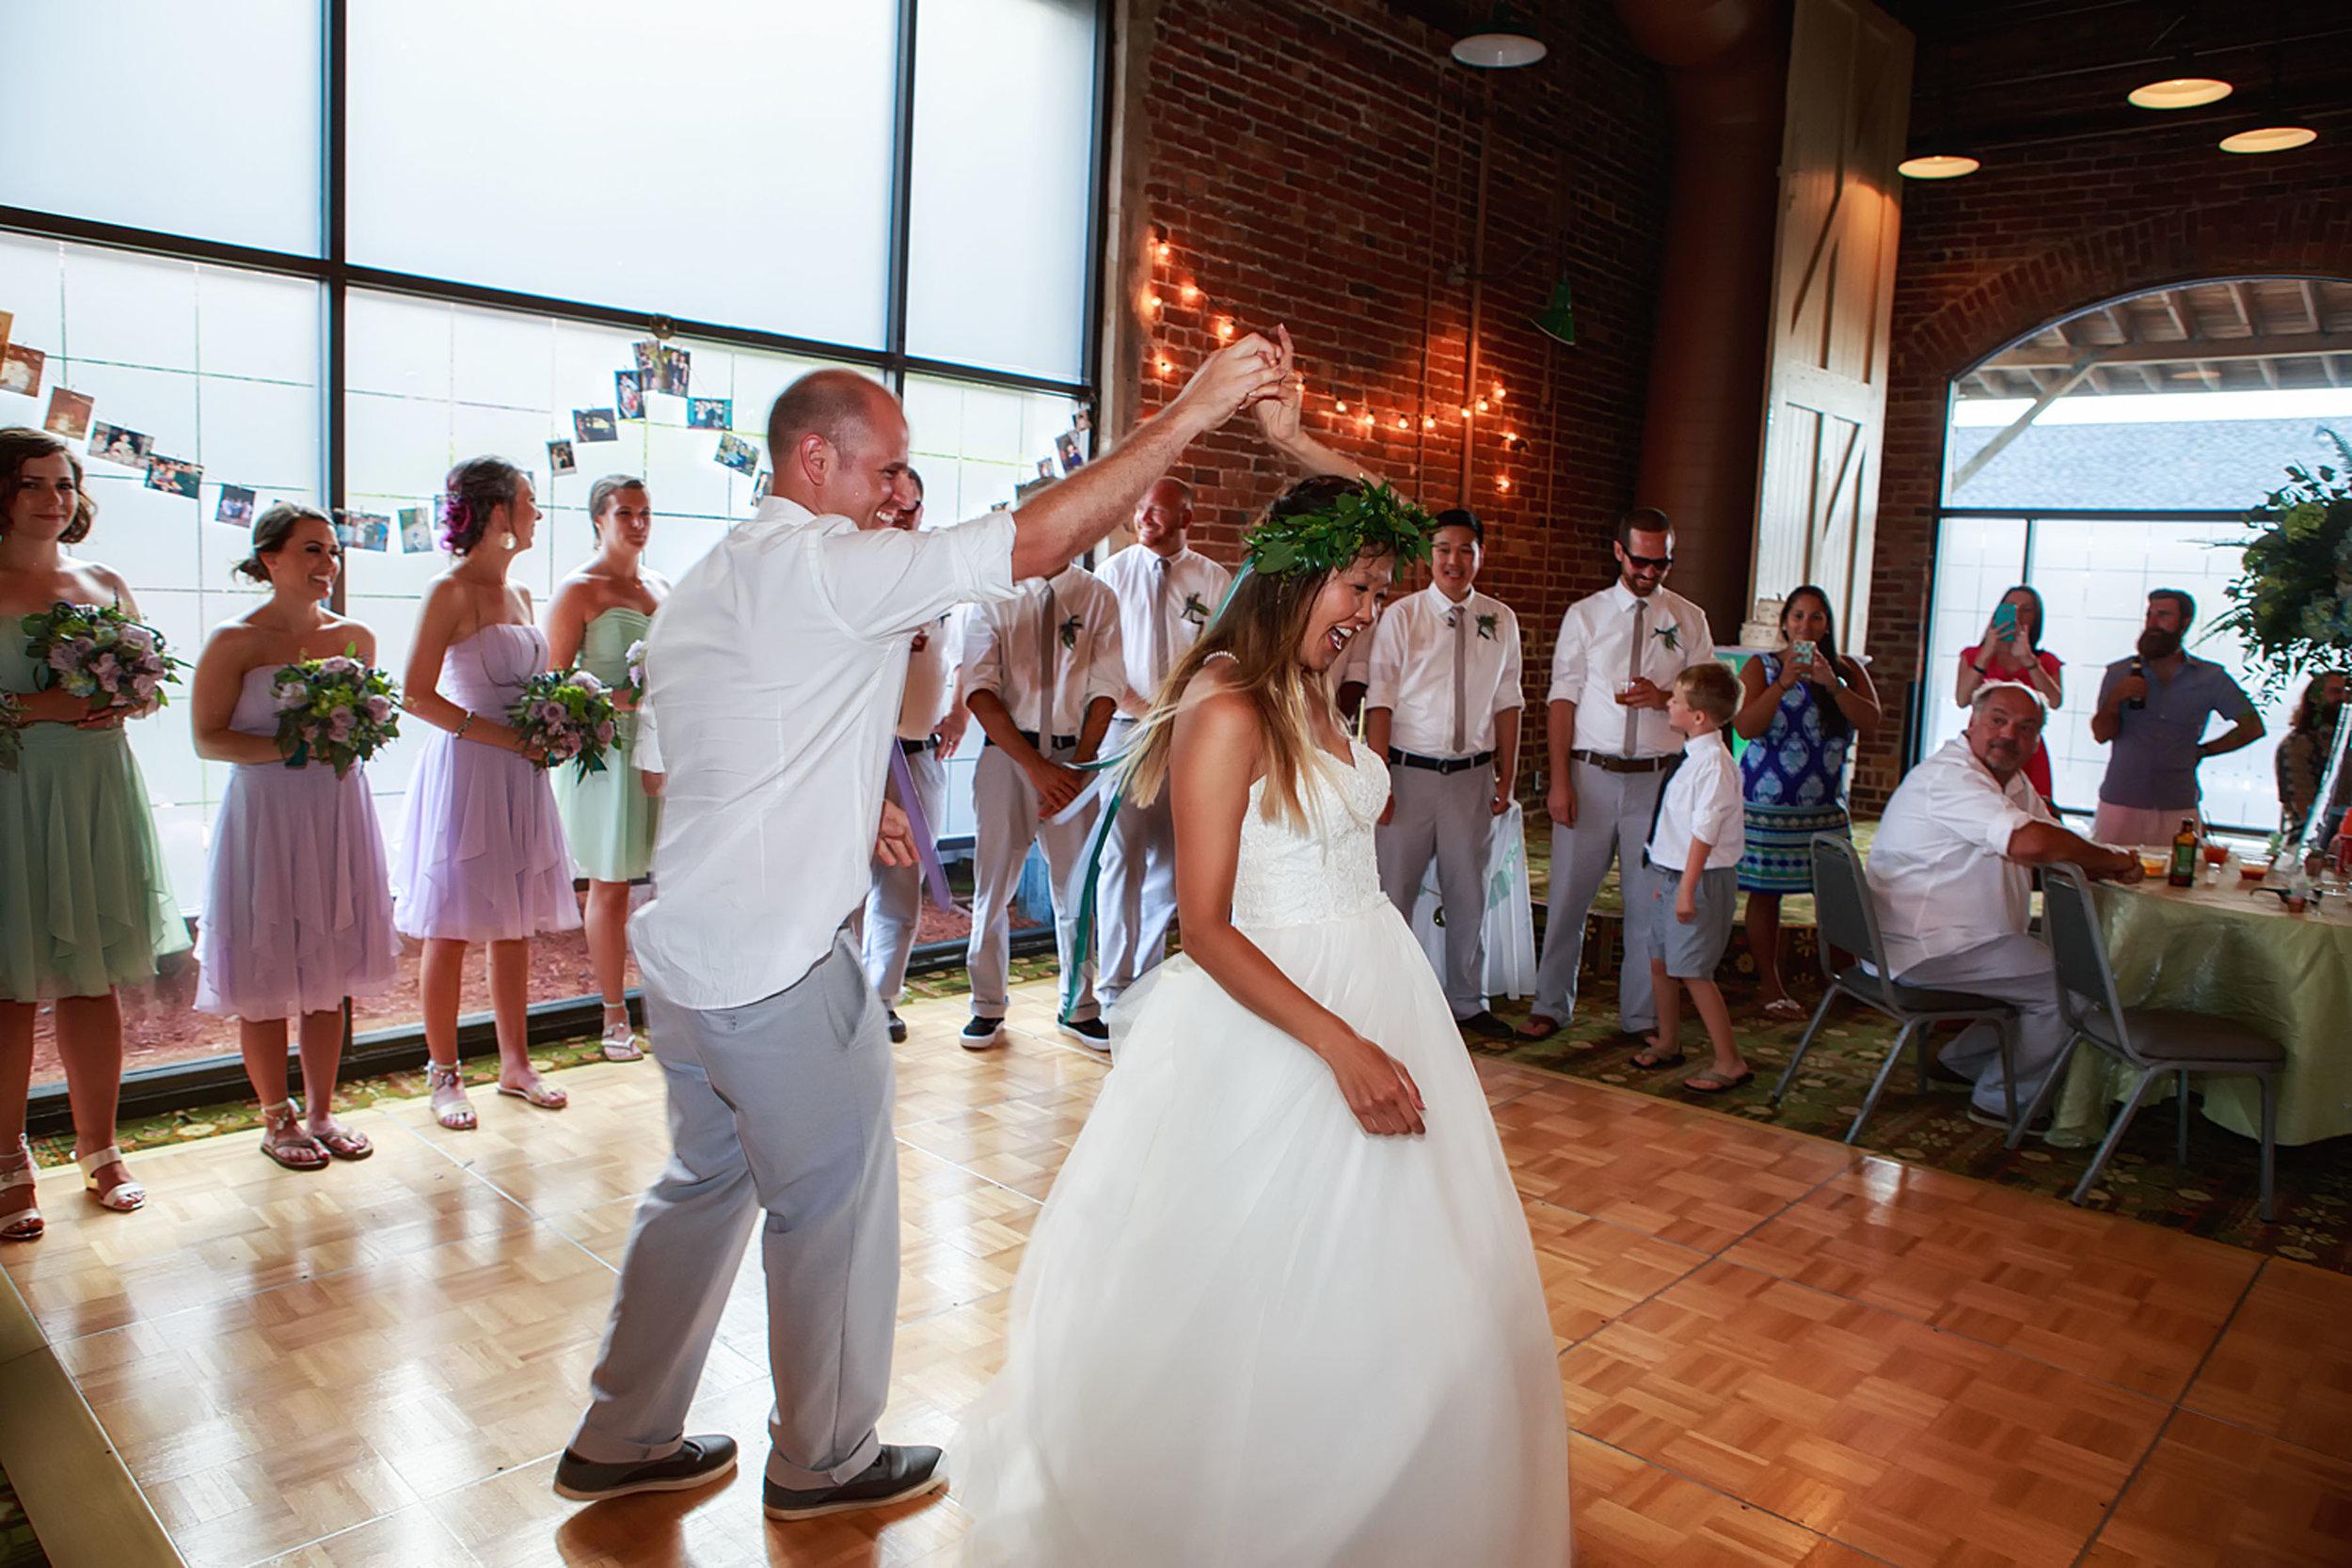 North_Carolina_Wedding_Photographer_Tiffany_Abruzzo_Reception_012.jpg